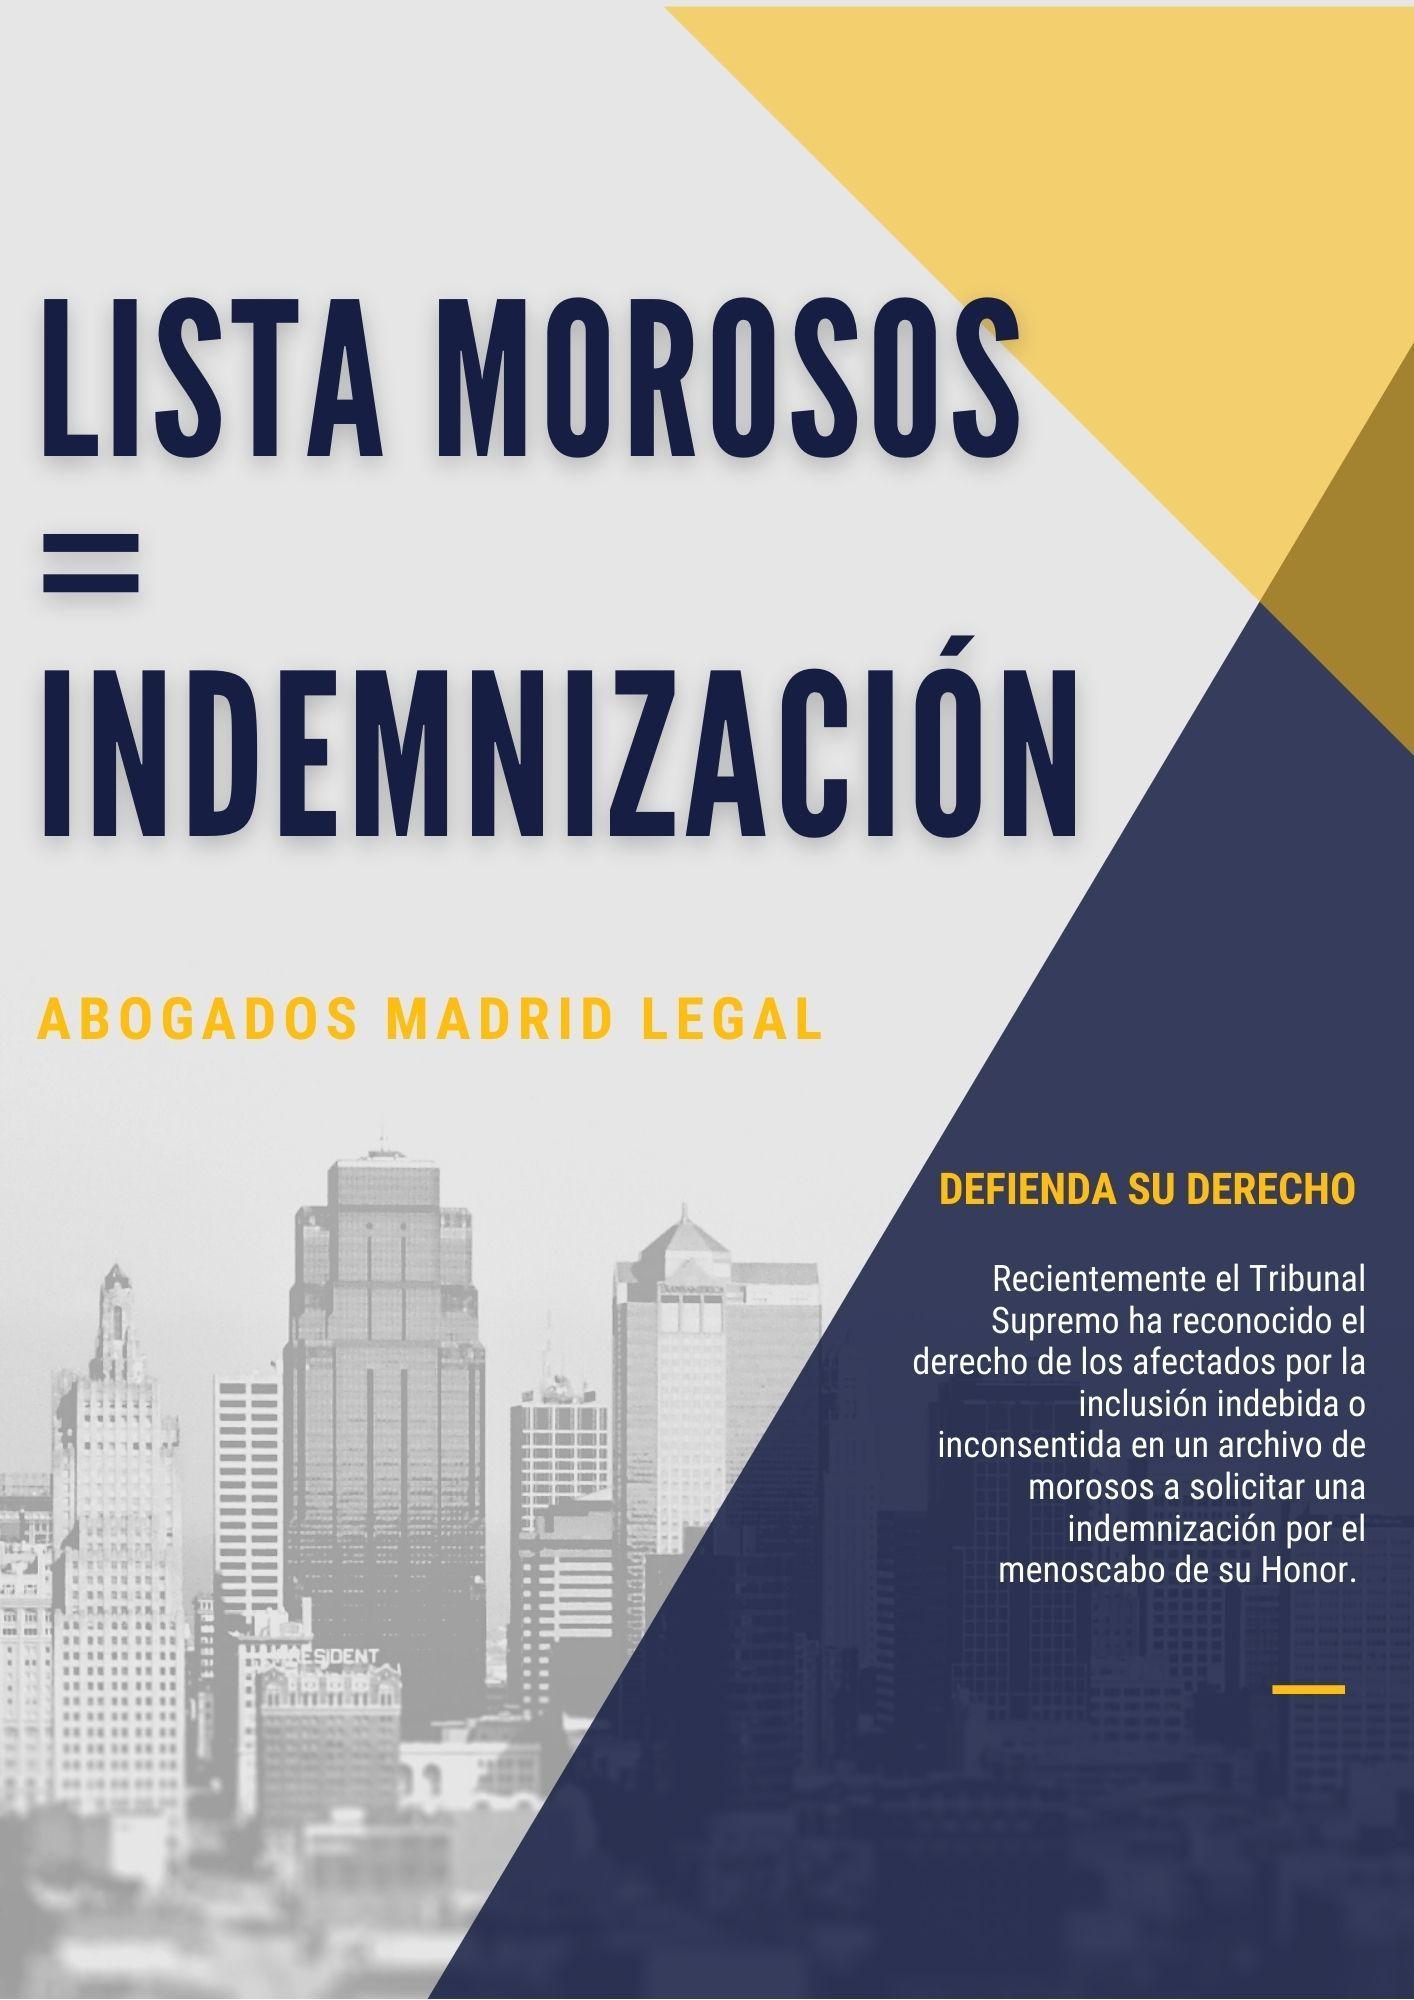 Abogados Madrid Legal